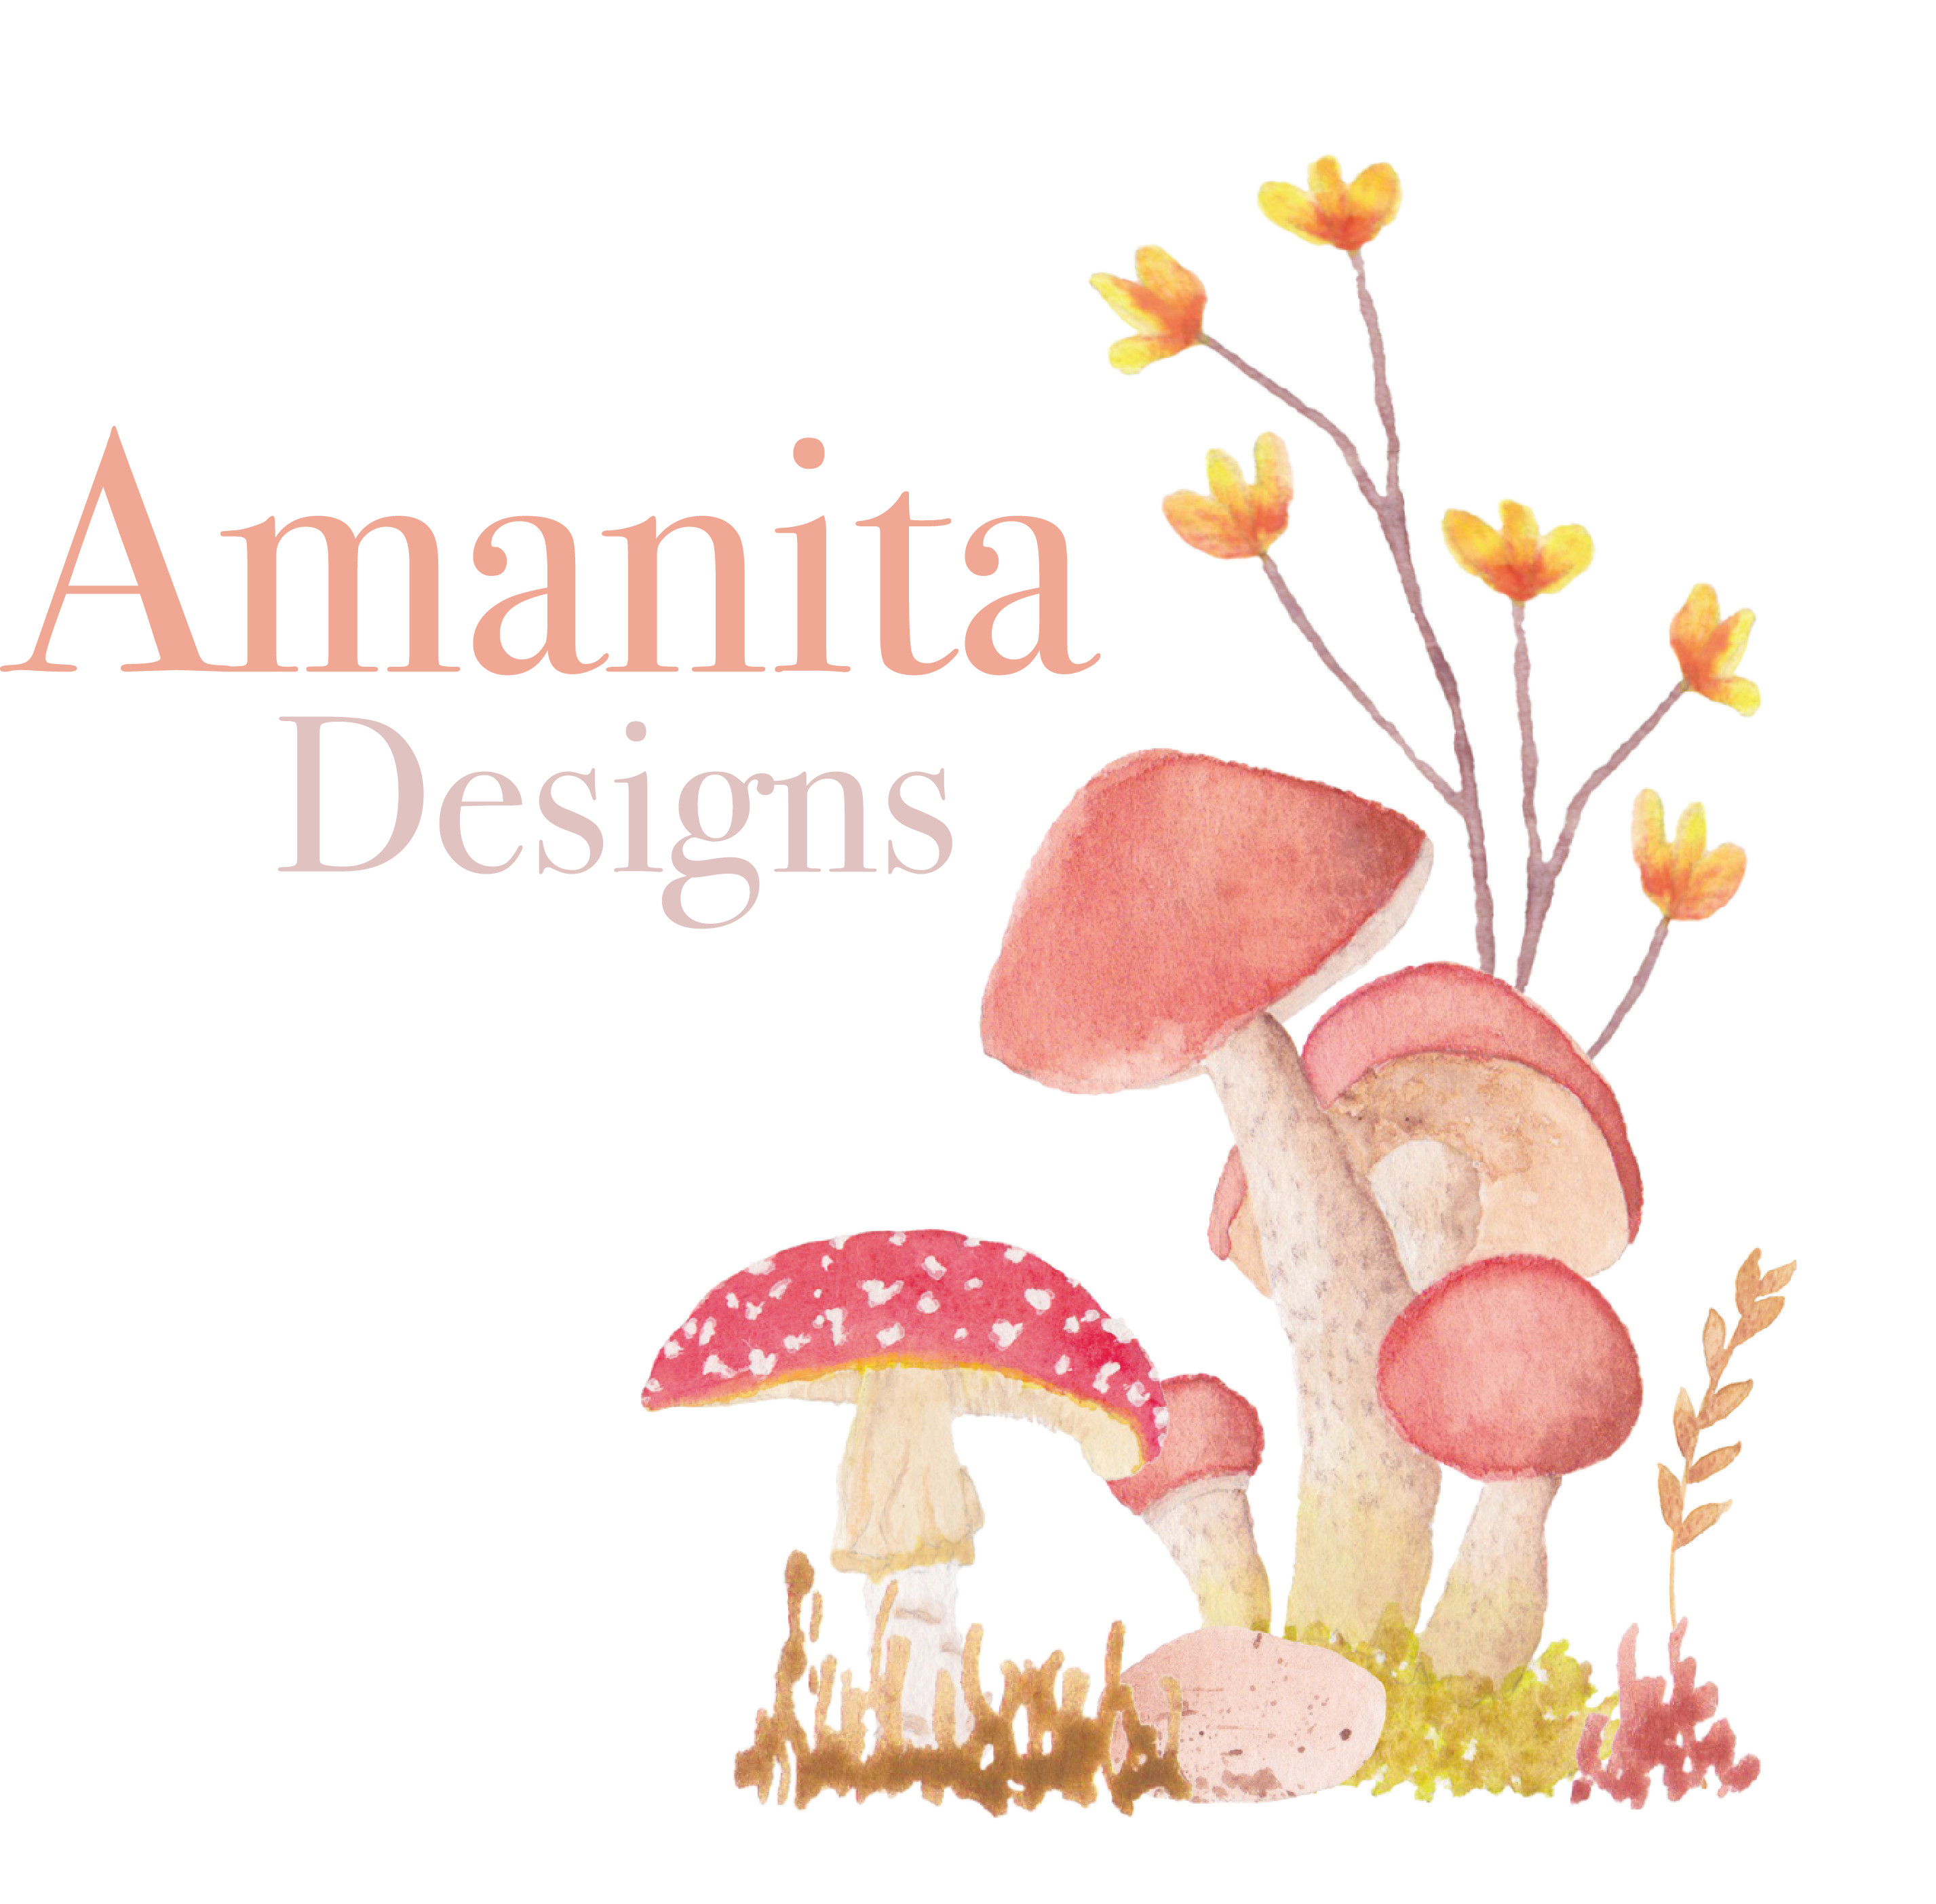 Amanita Designs